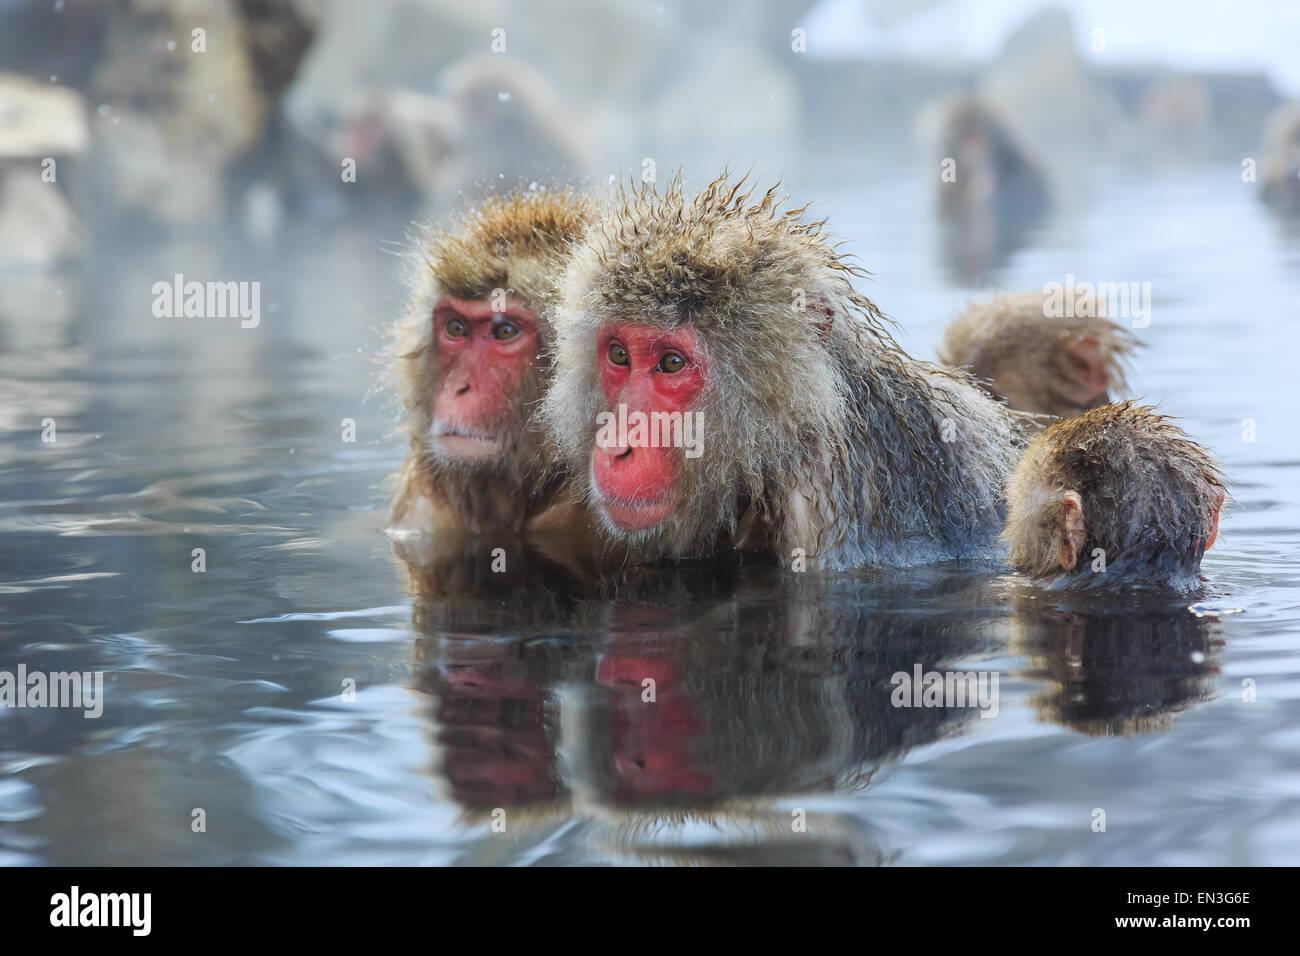 Snow monkeys in a natural onsen (hot spring), located in Jigokudani Park, Yudanaka. Nagano Japan. - Stock Image